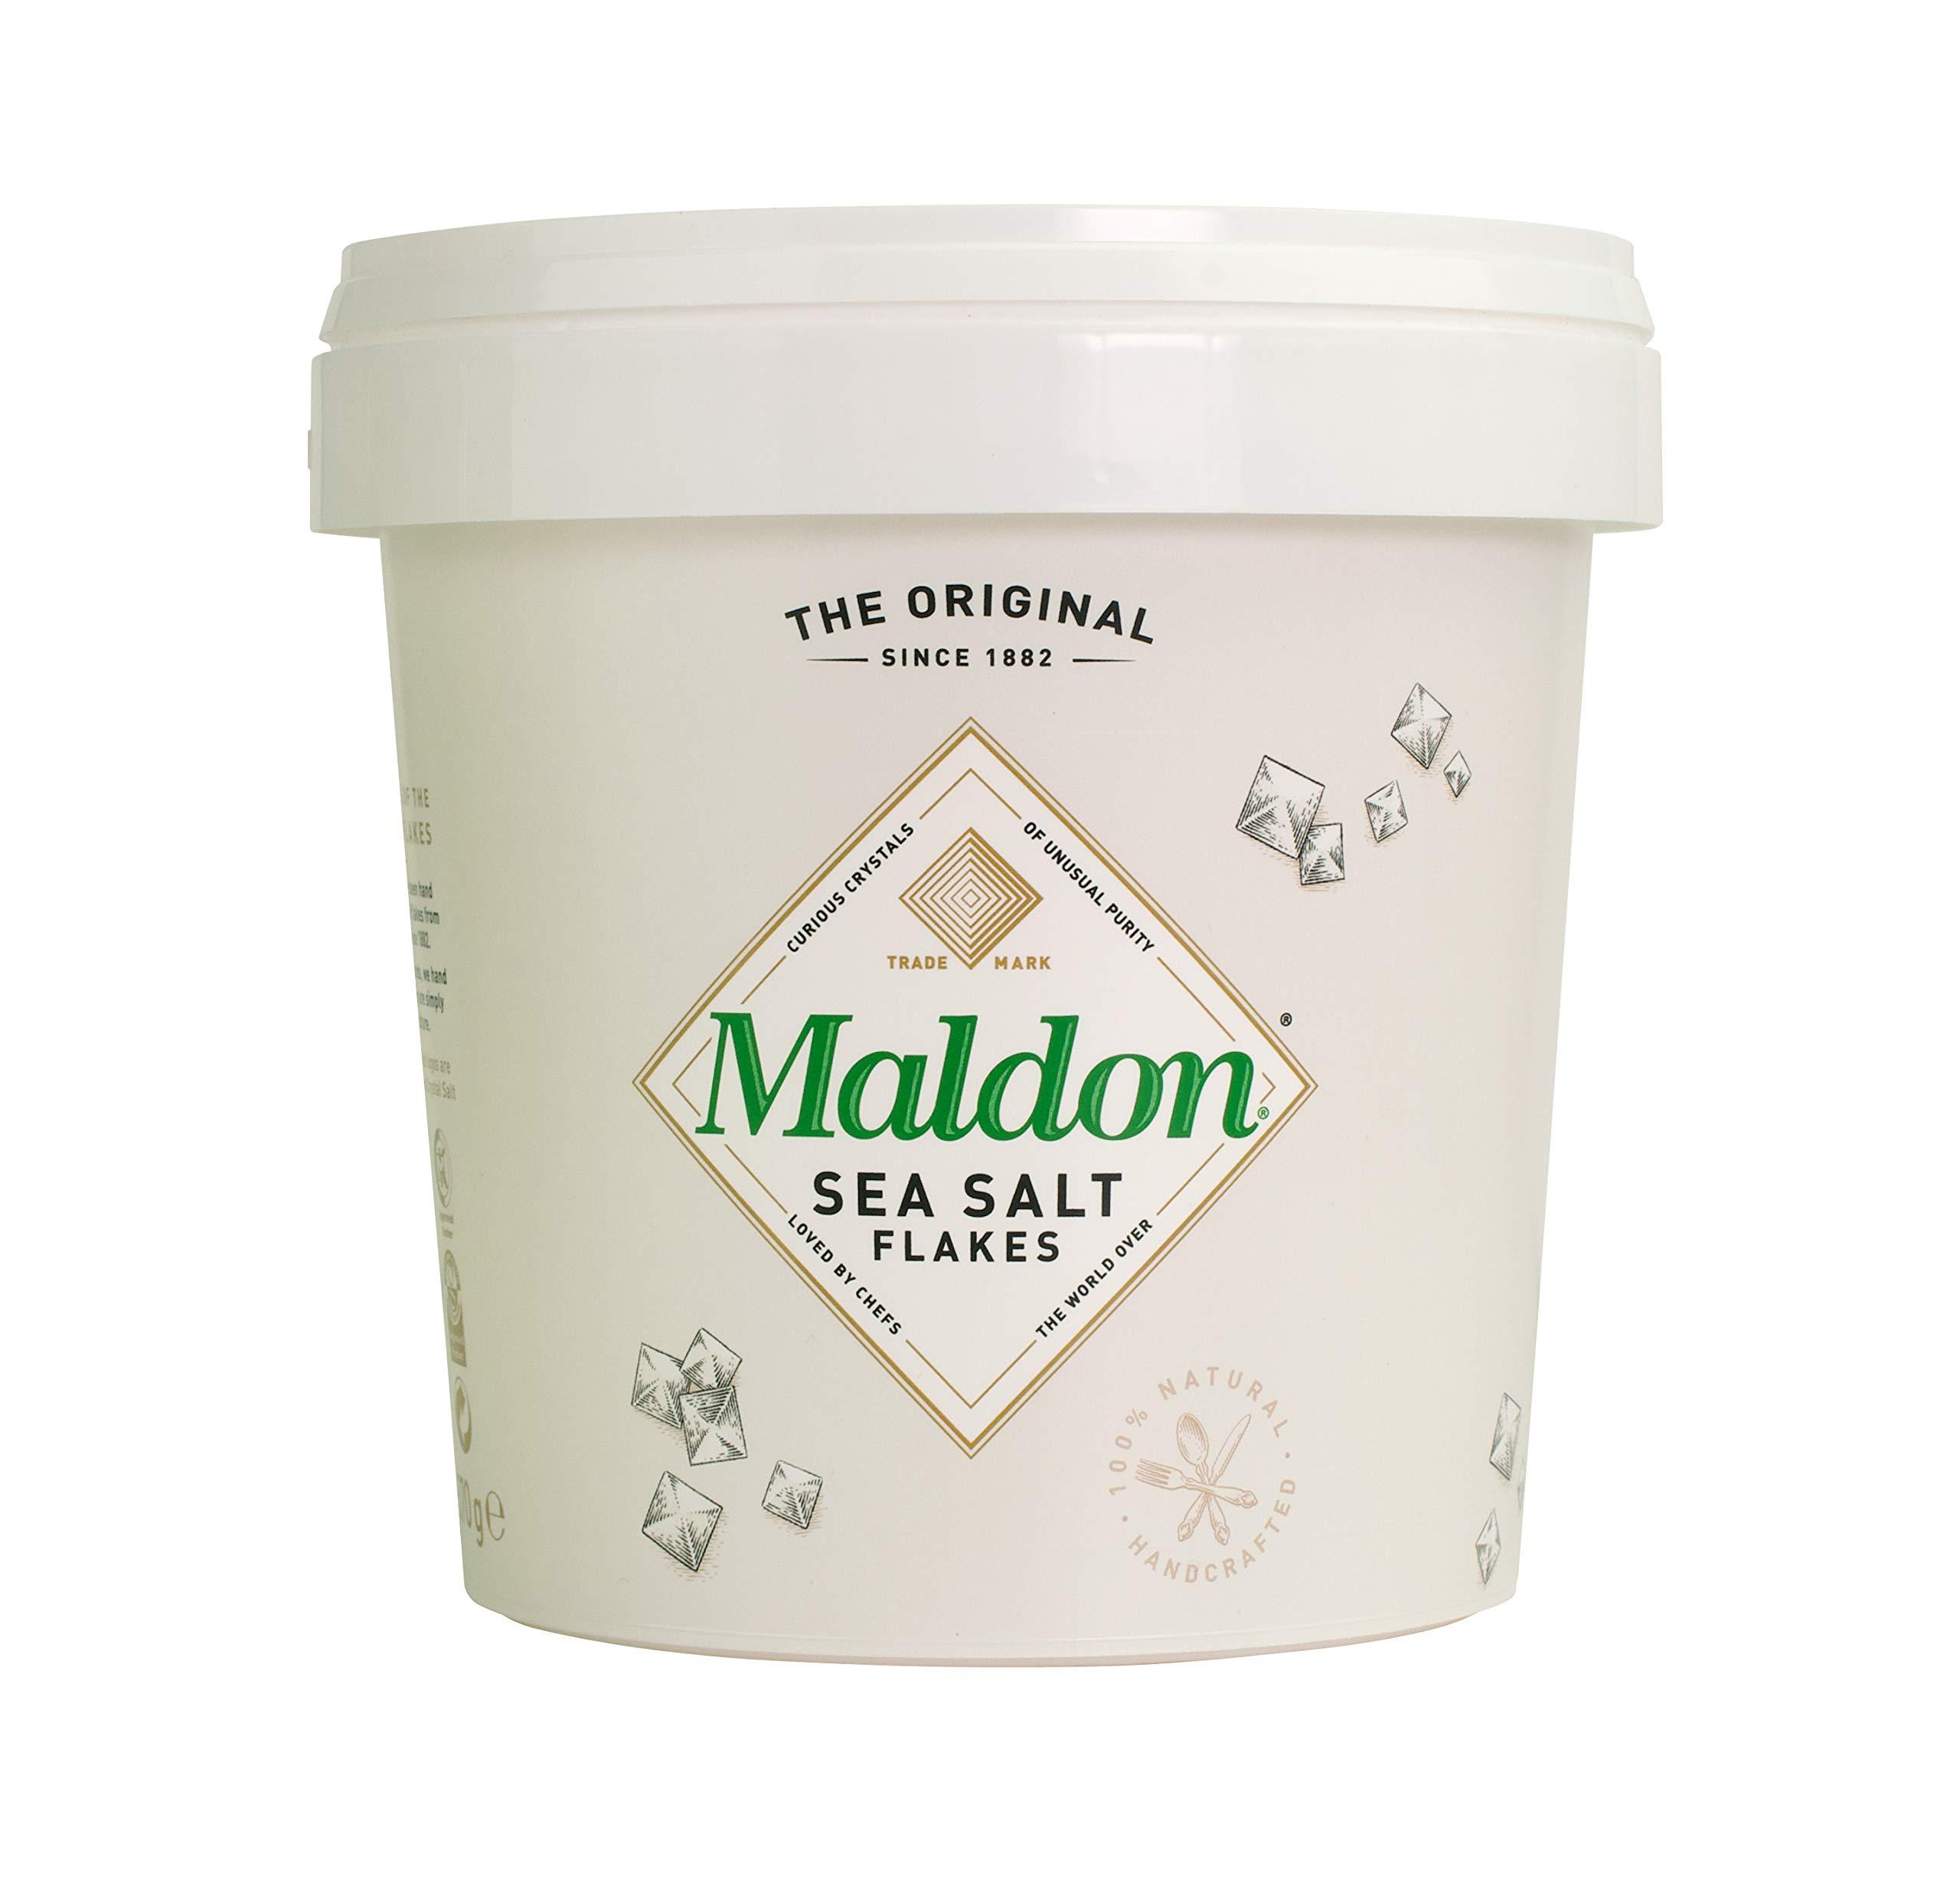 Maldon Salt, Sea Salt Flakes, 20 oz (570 g), Resealable Tub, Kosher, Natural, Handcrafted, Gourmet, Pyramid Crystals